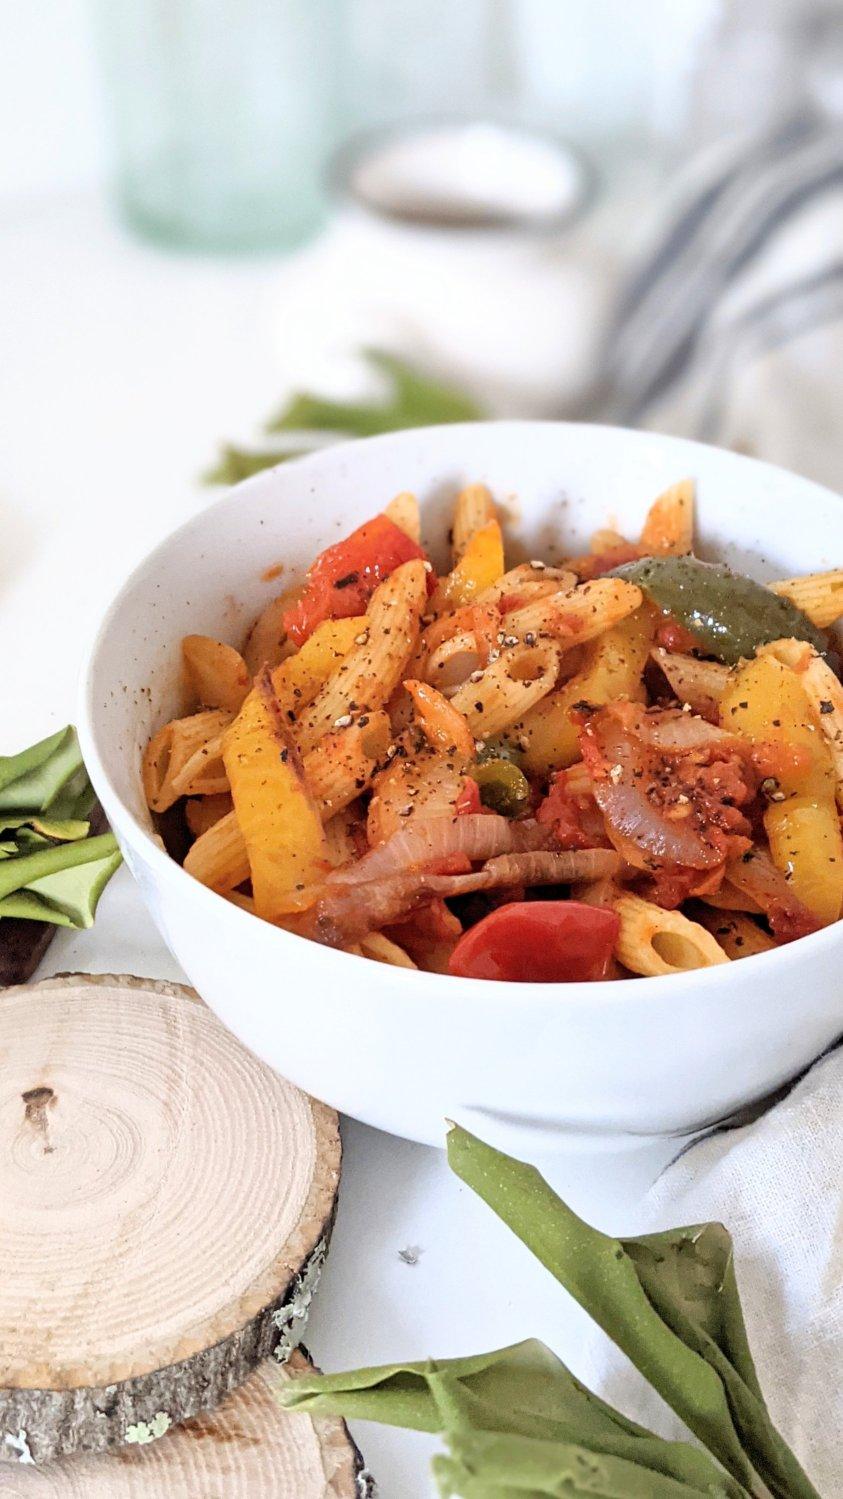 gluten free rasta pasta recipe vegan vegetarian rastafarian pasta bell peppers onions capsicum recipes healthy homemade noodles with sheet pan sauce